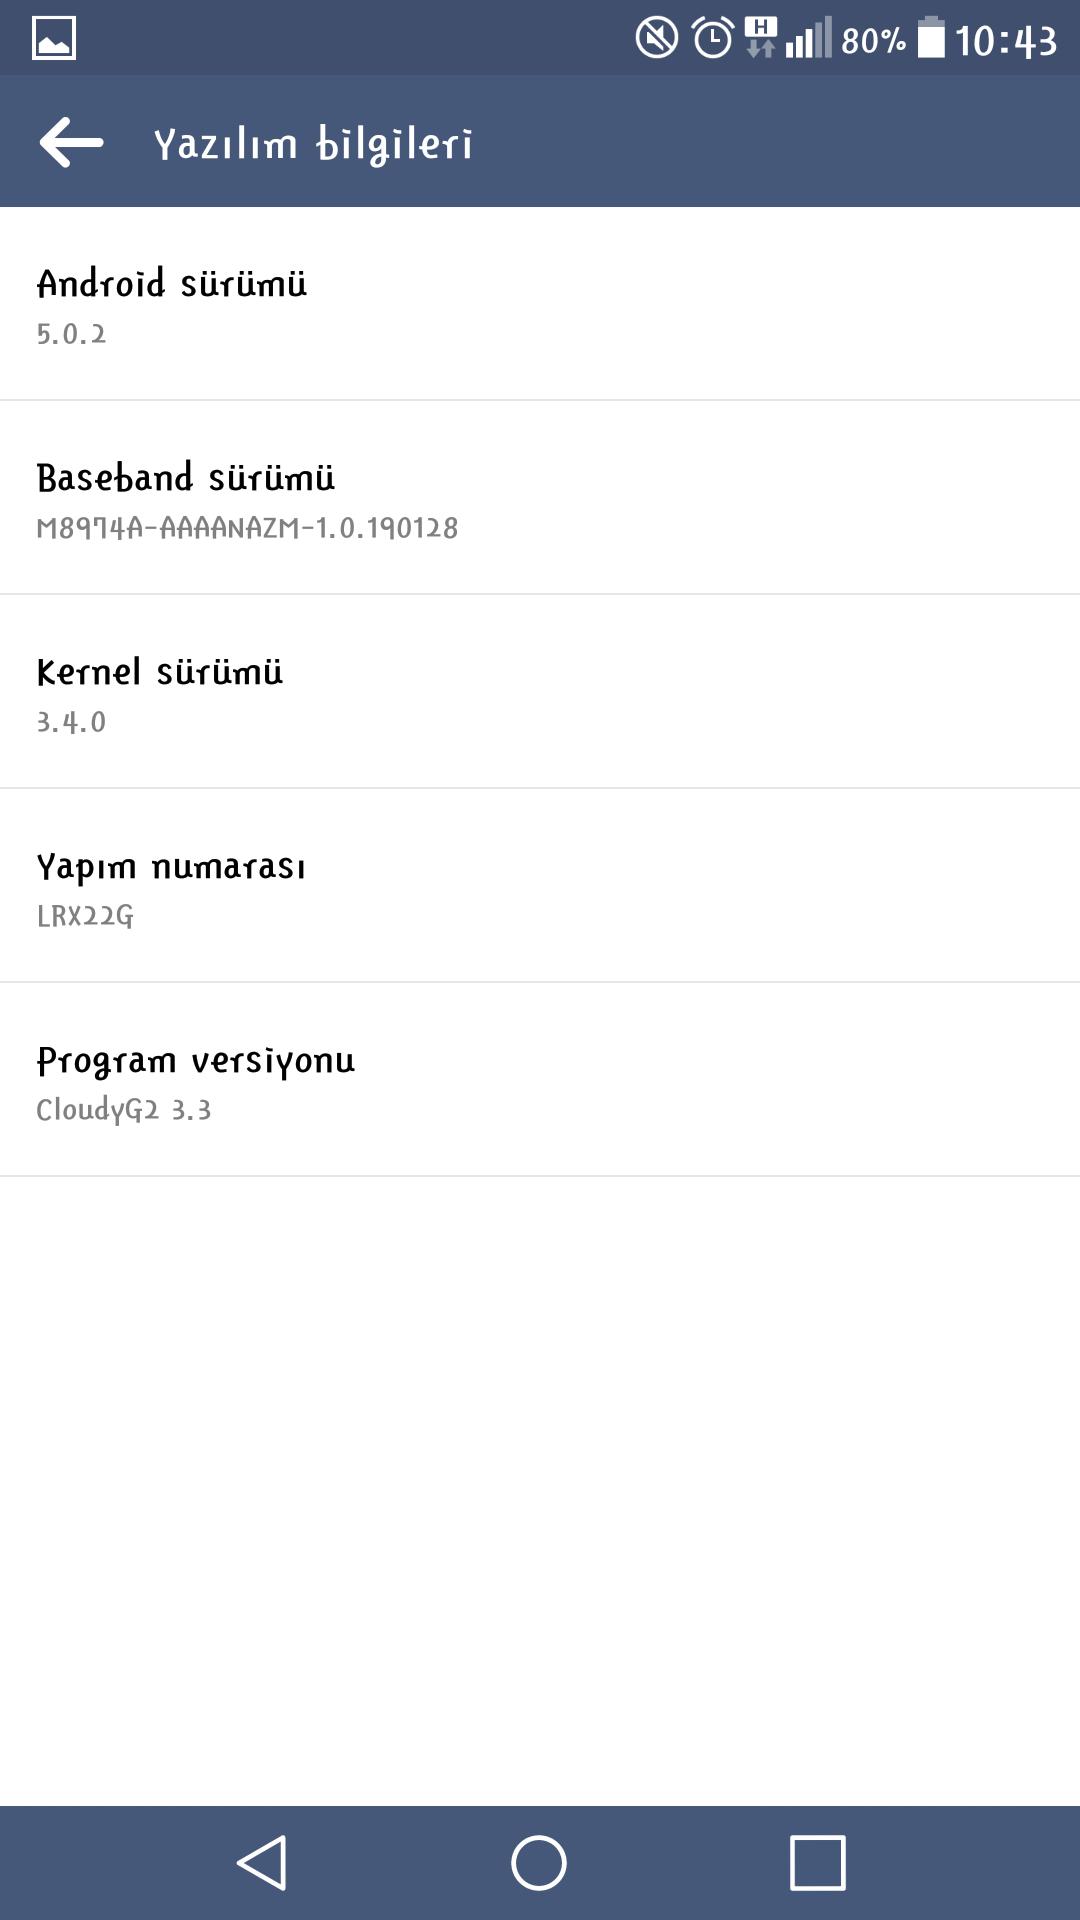 6mBvV0.png